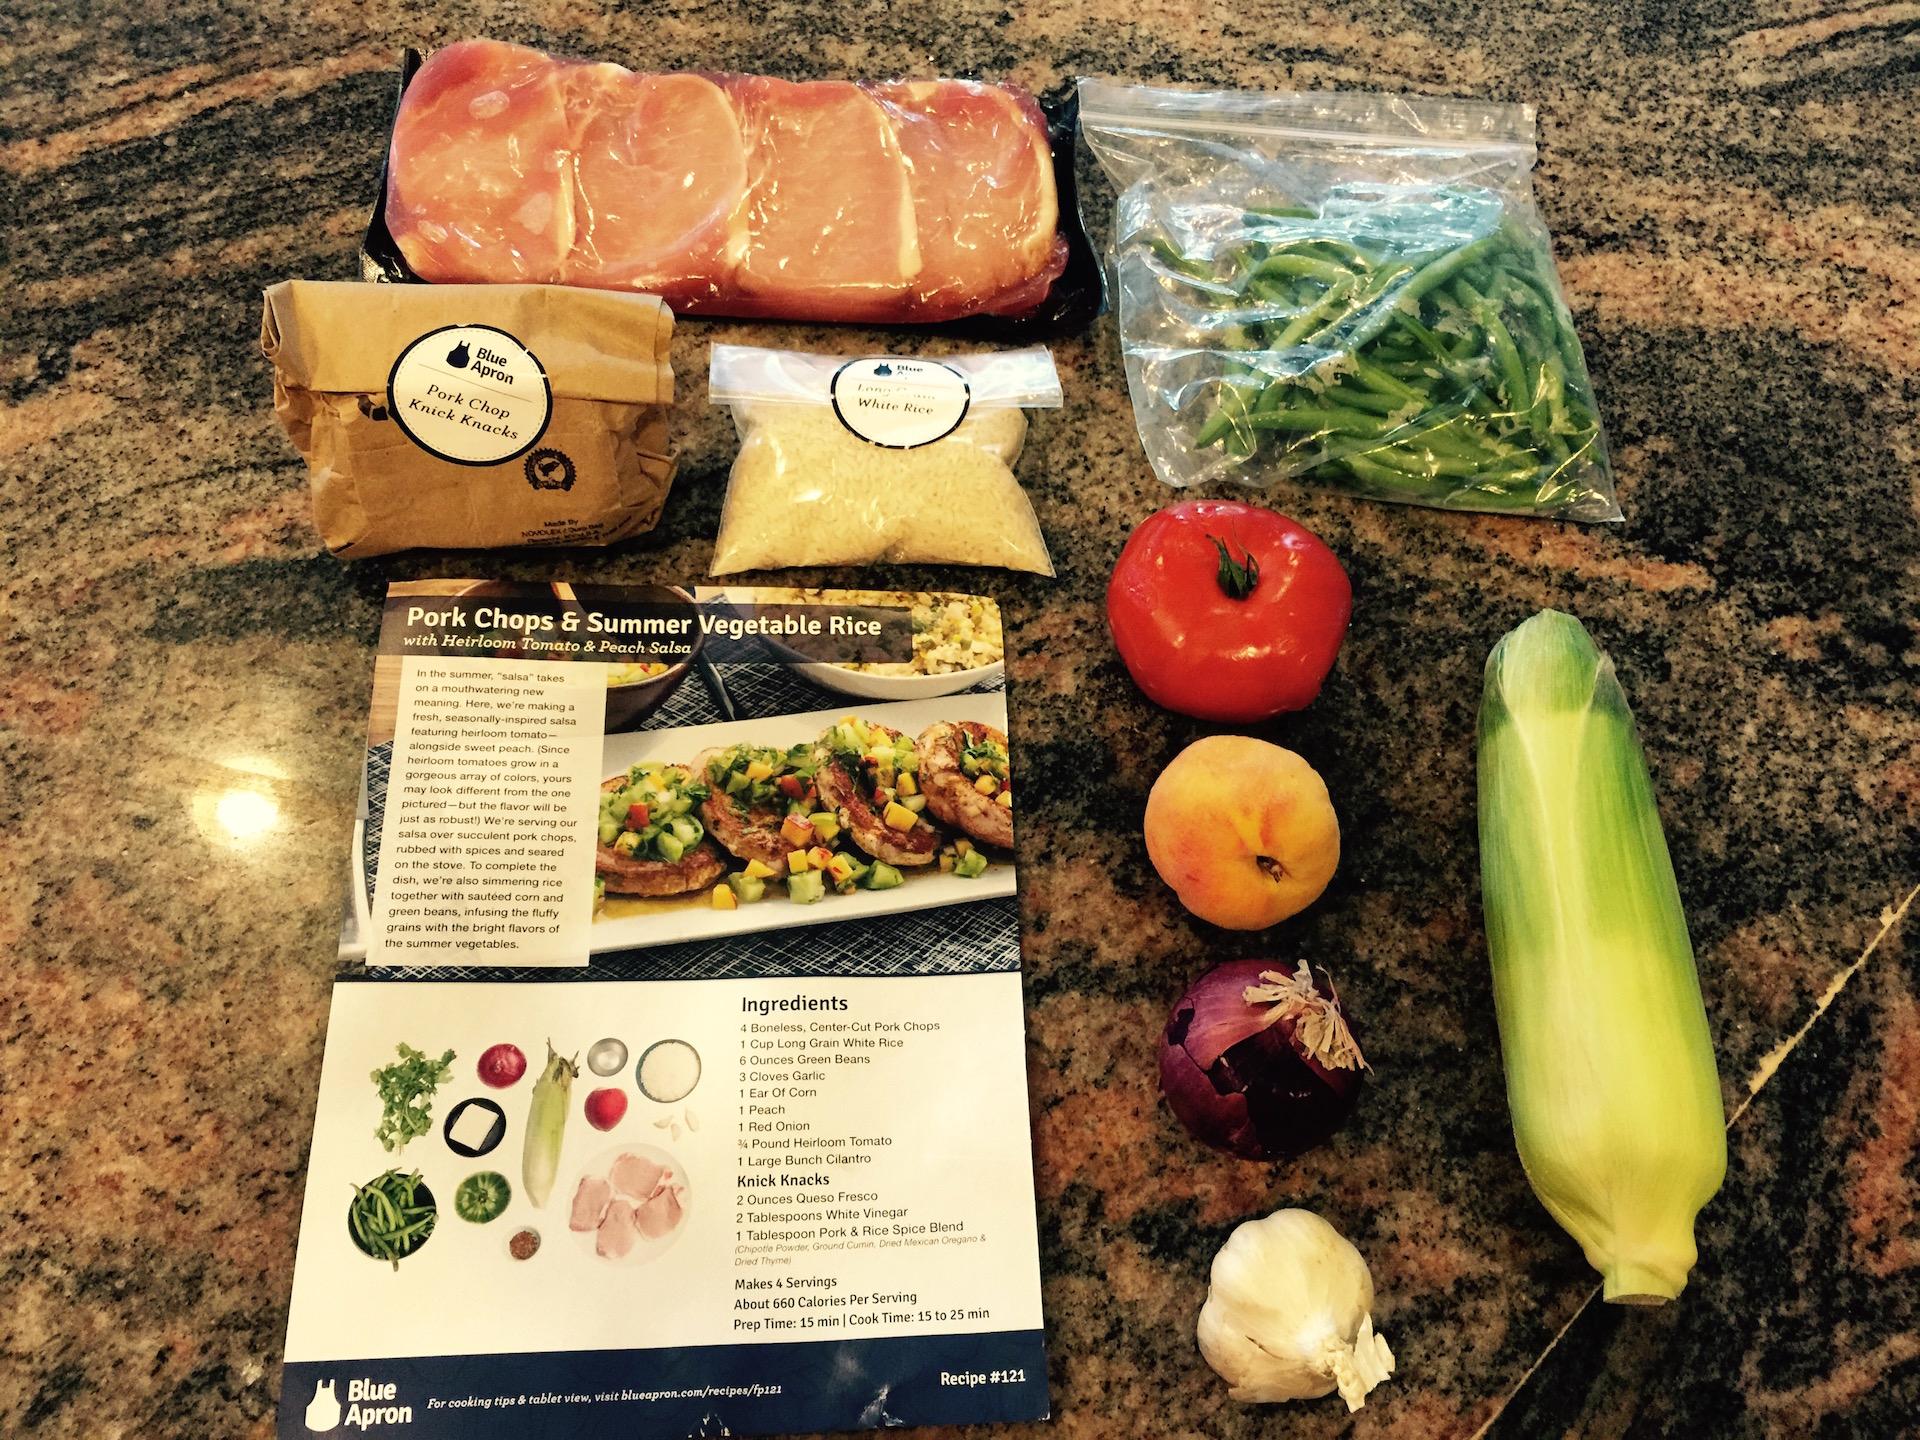 Blue apron cost -  Blue Apron Meal